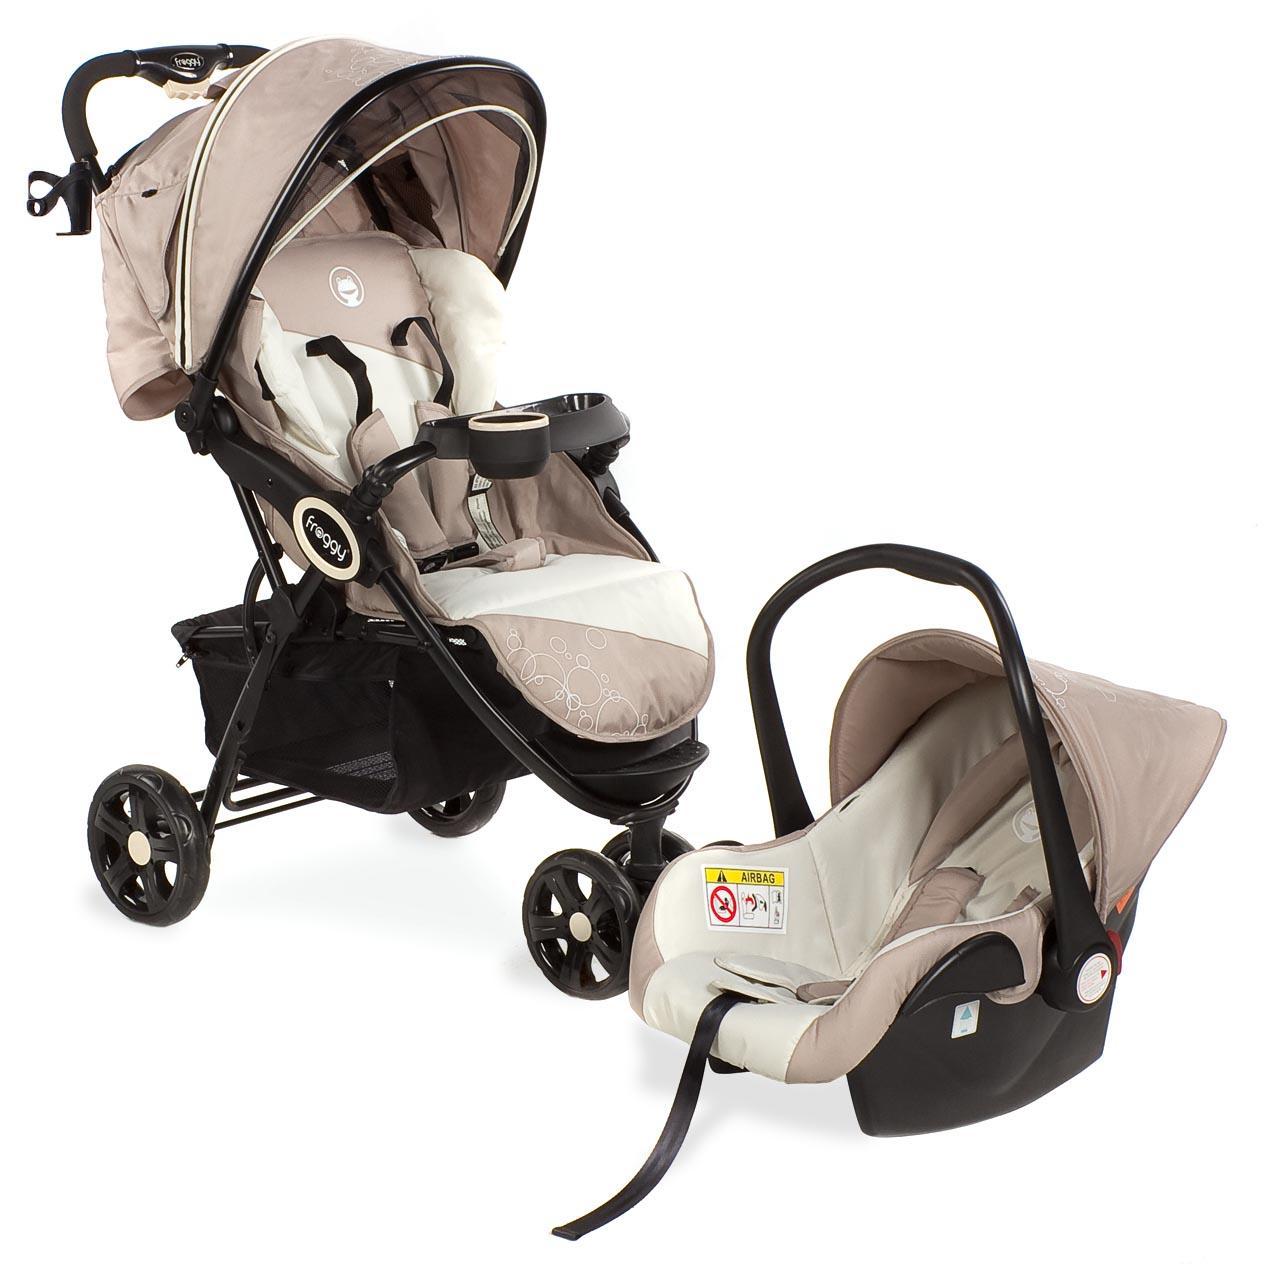 froggy 2in1 set dingo kinderwagen autositz buggy. Black Bedroom Furniture Sets. Home Design Ideas